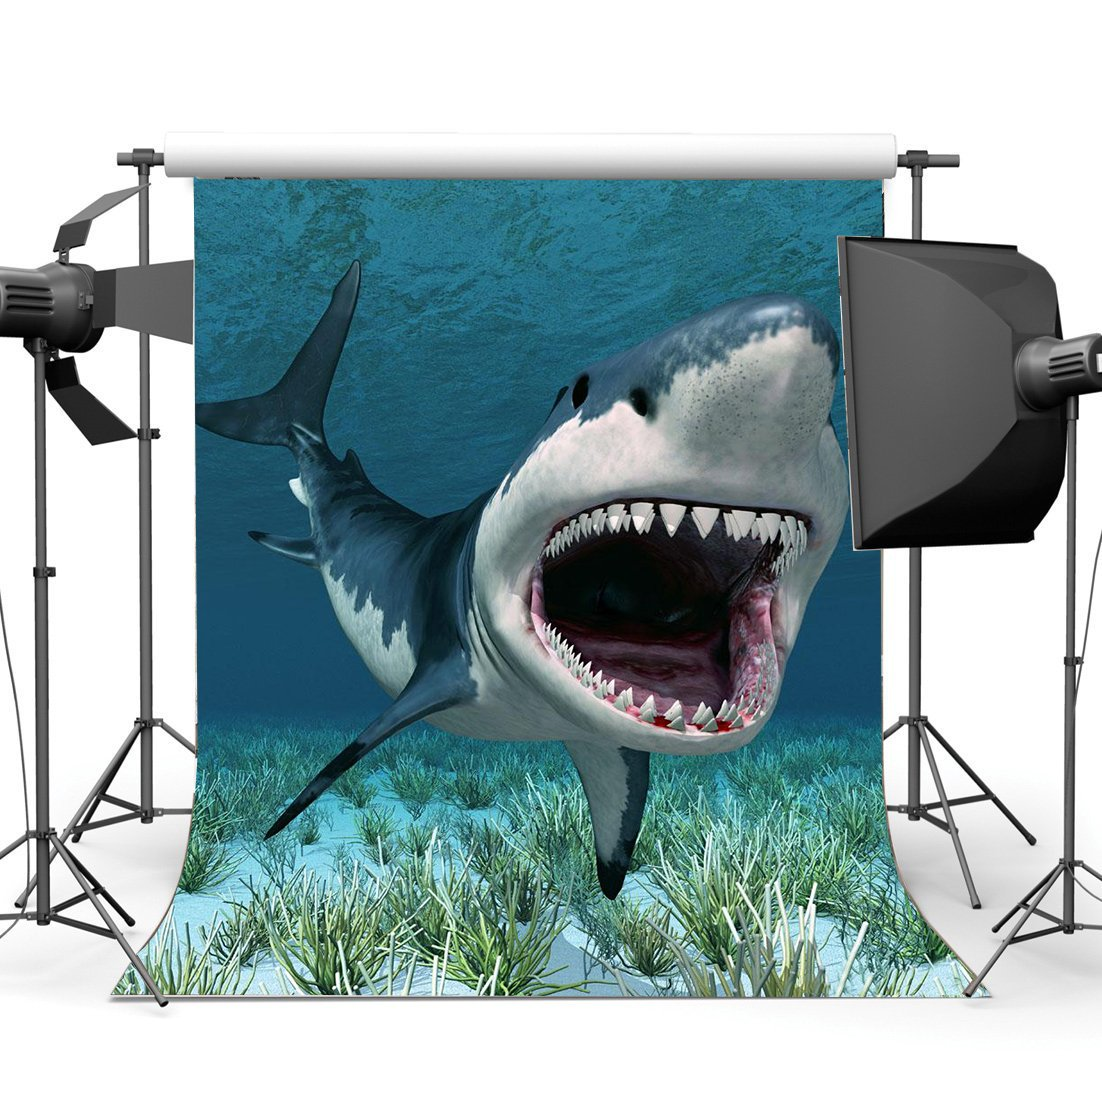 Cartoon Shark Backdrop Underwater World Green Grass Aquarium Ocean Sailing Photography Background-in Photo Studio Accessories from Consumer Electronics